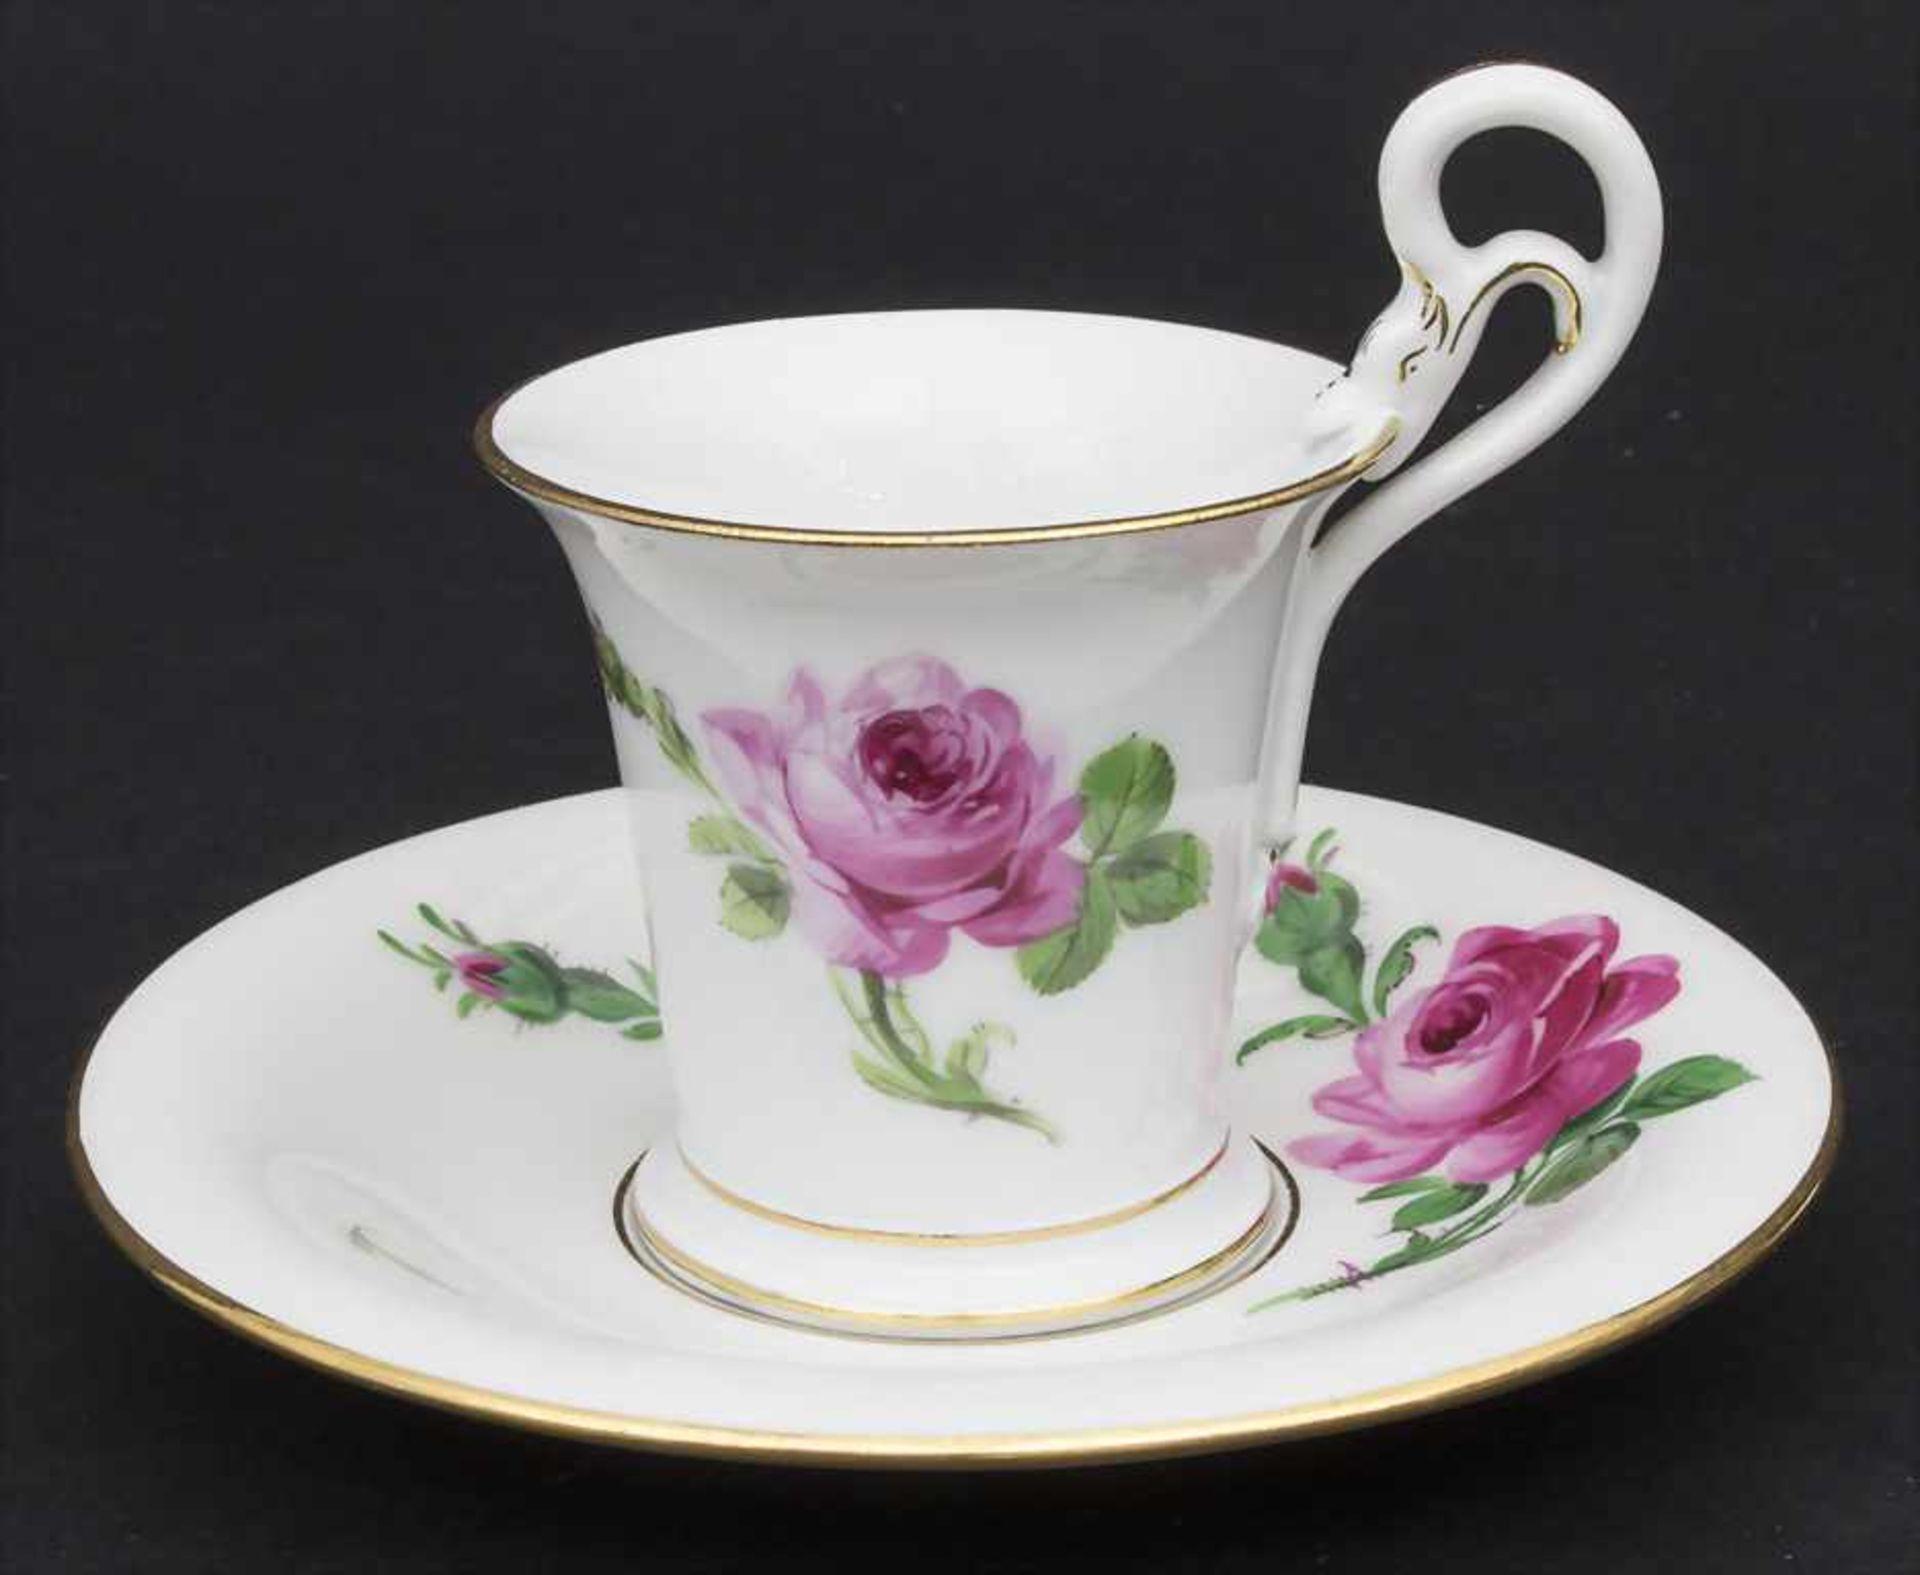 Konvolut Porzellane mit Rosendekor / A set of porcelain with roses, Meissen, 20. Jh. - Bild 2 aus 13